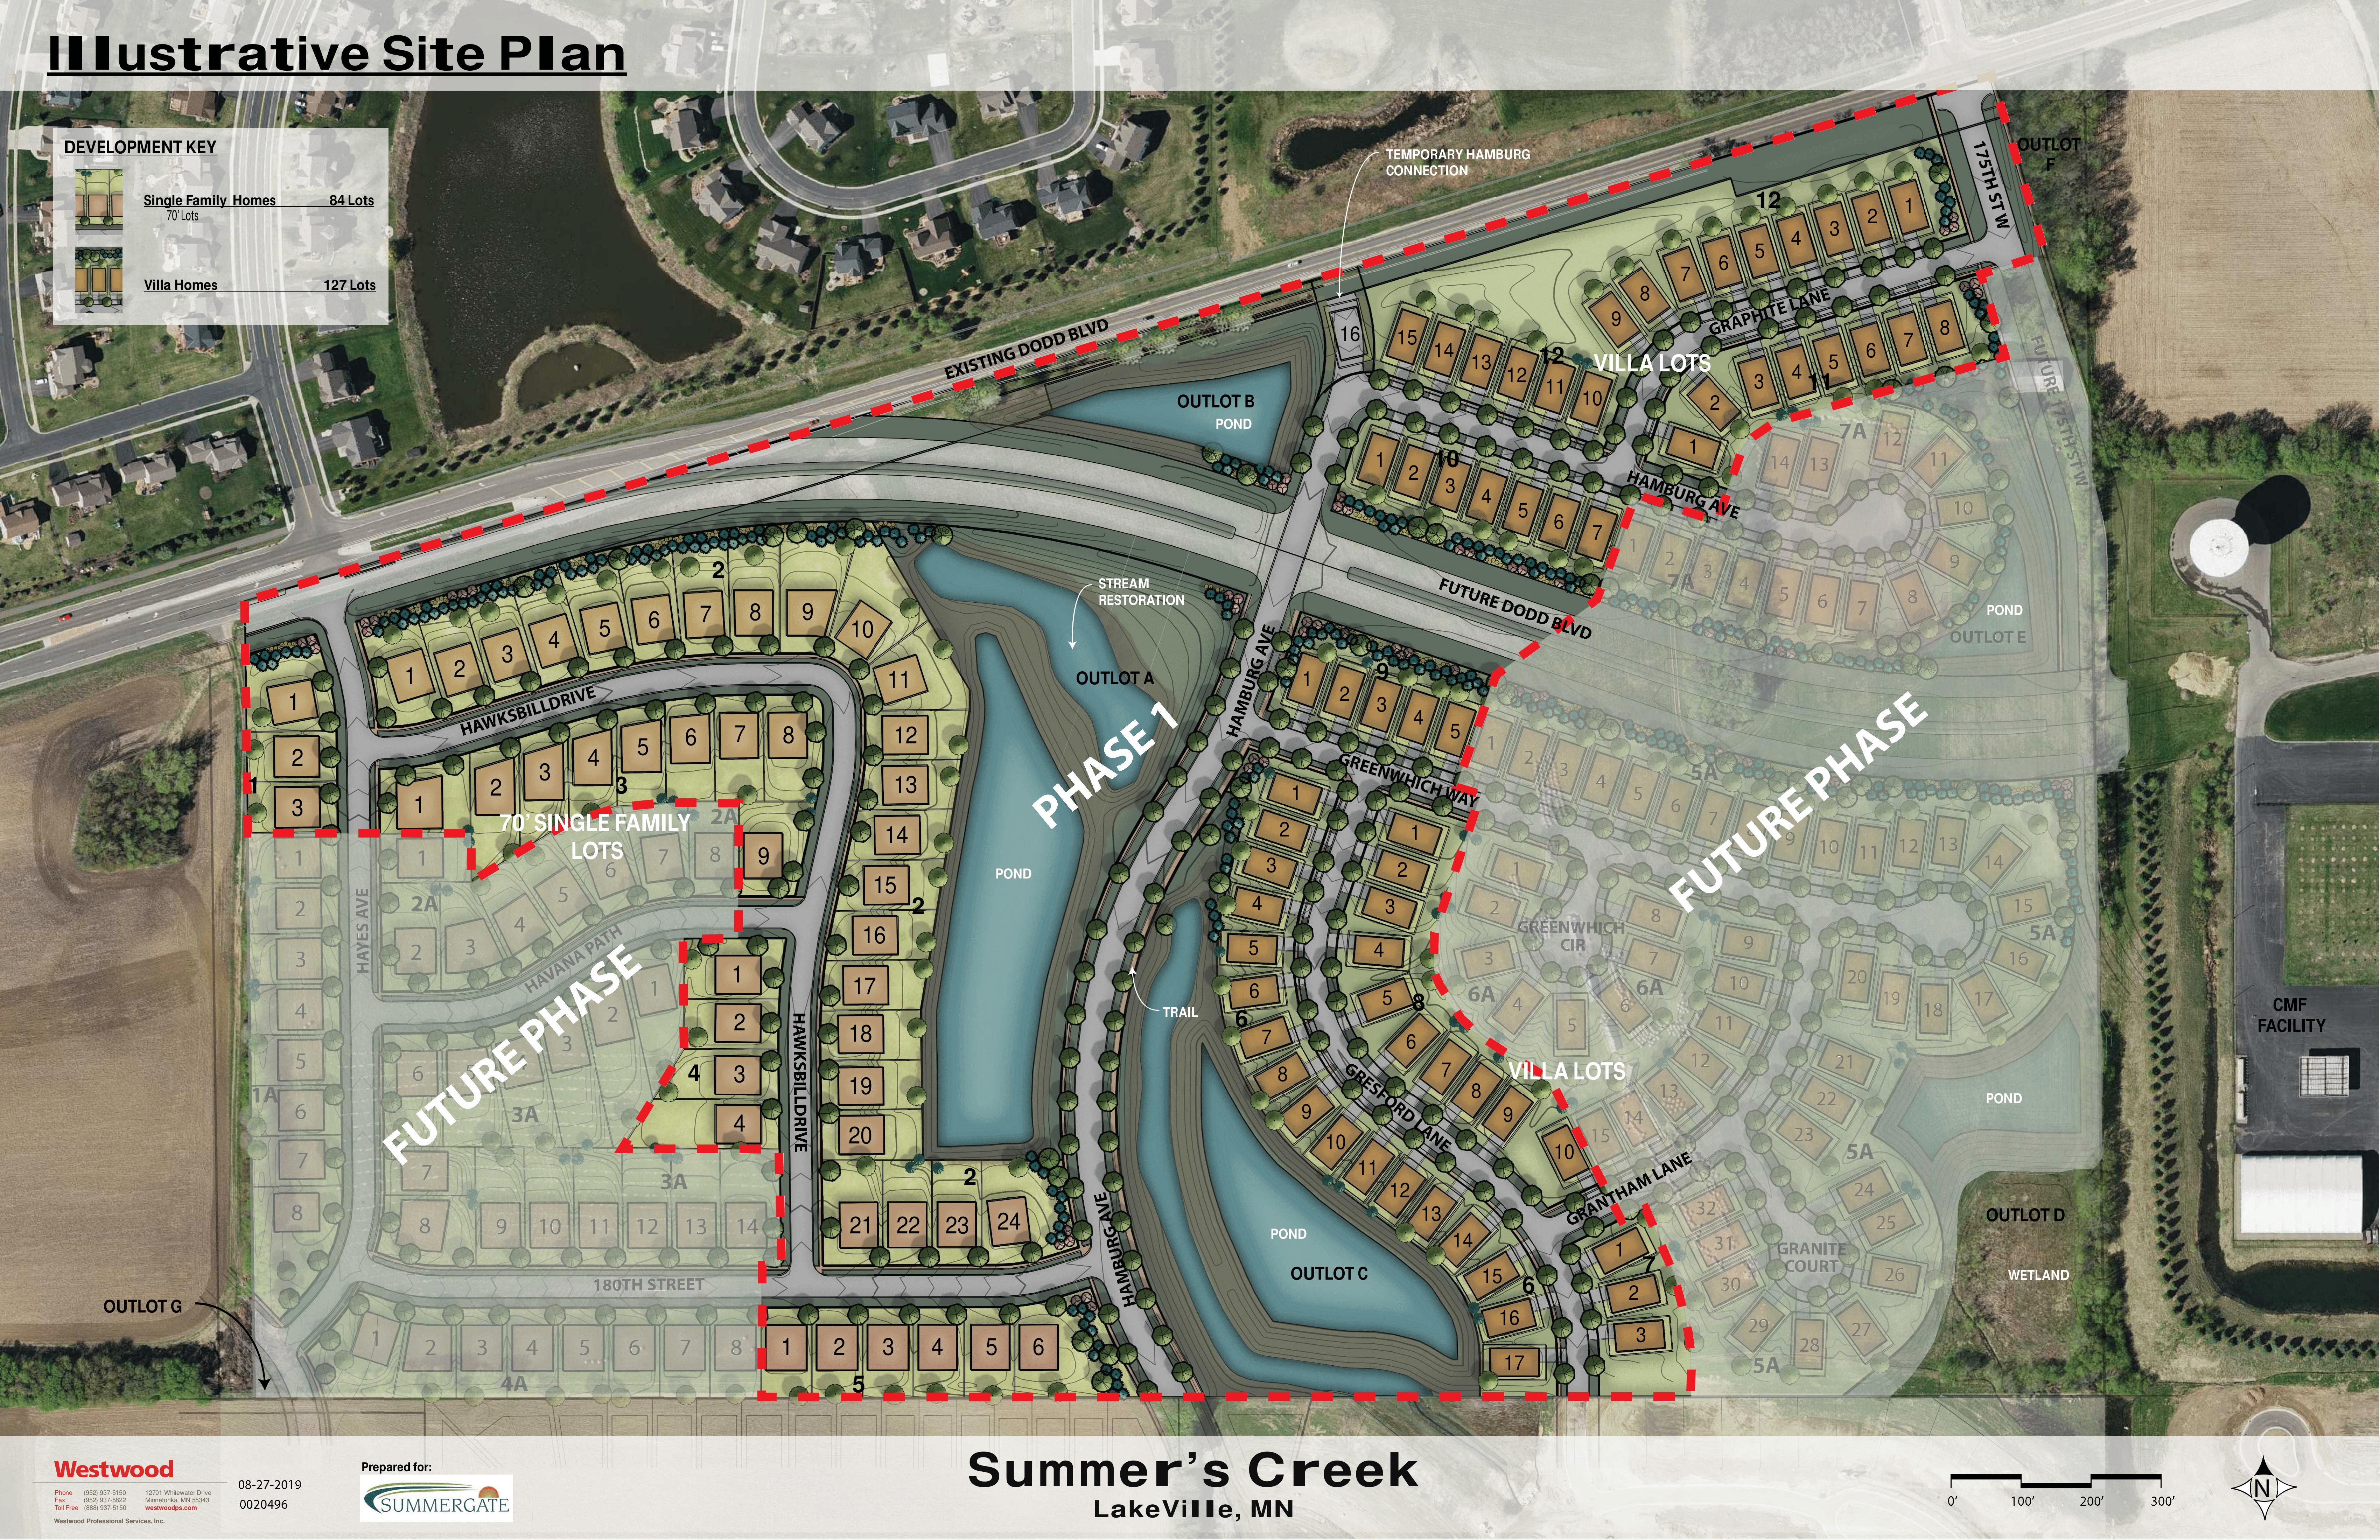 19.08.27 Phase 1 Site Plan Rendering 1